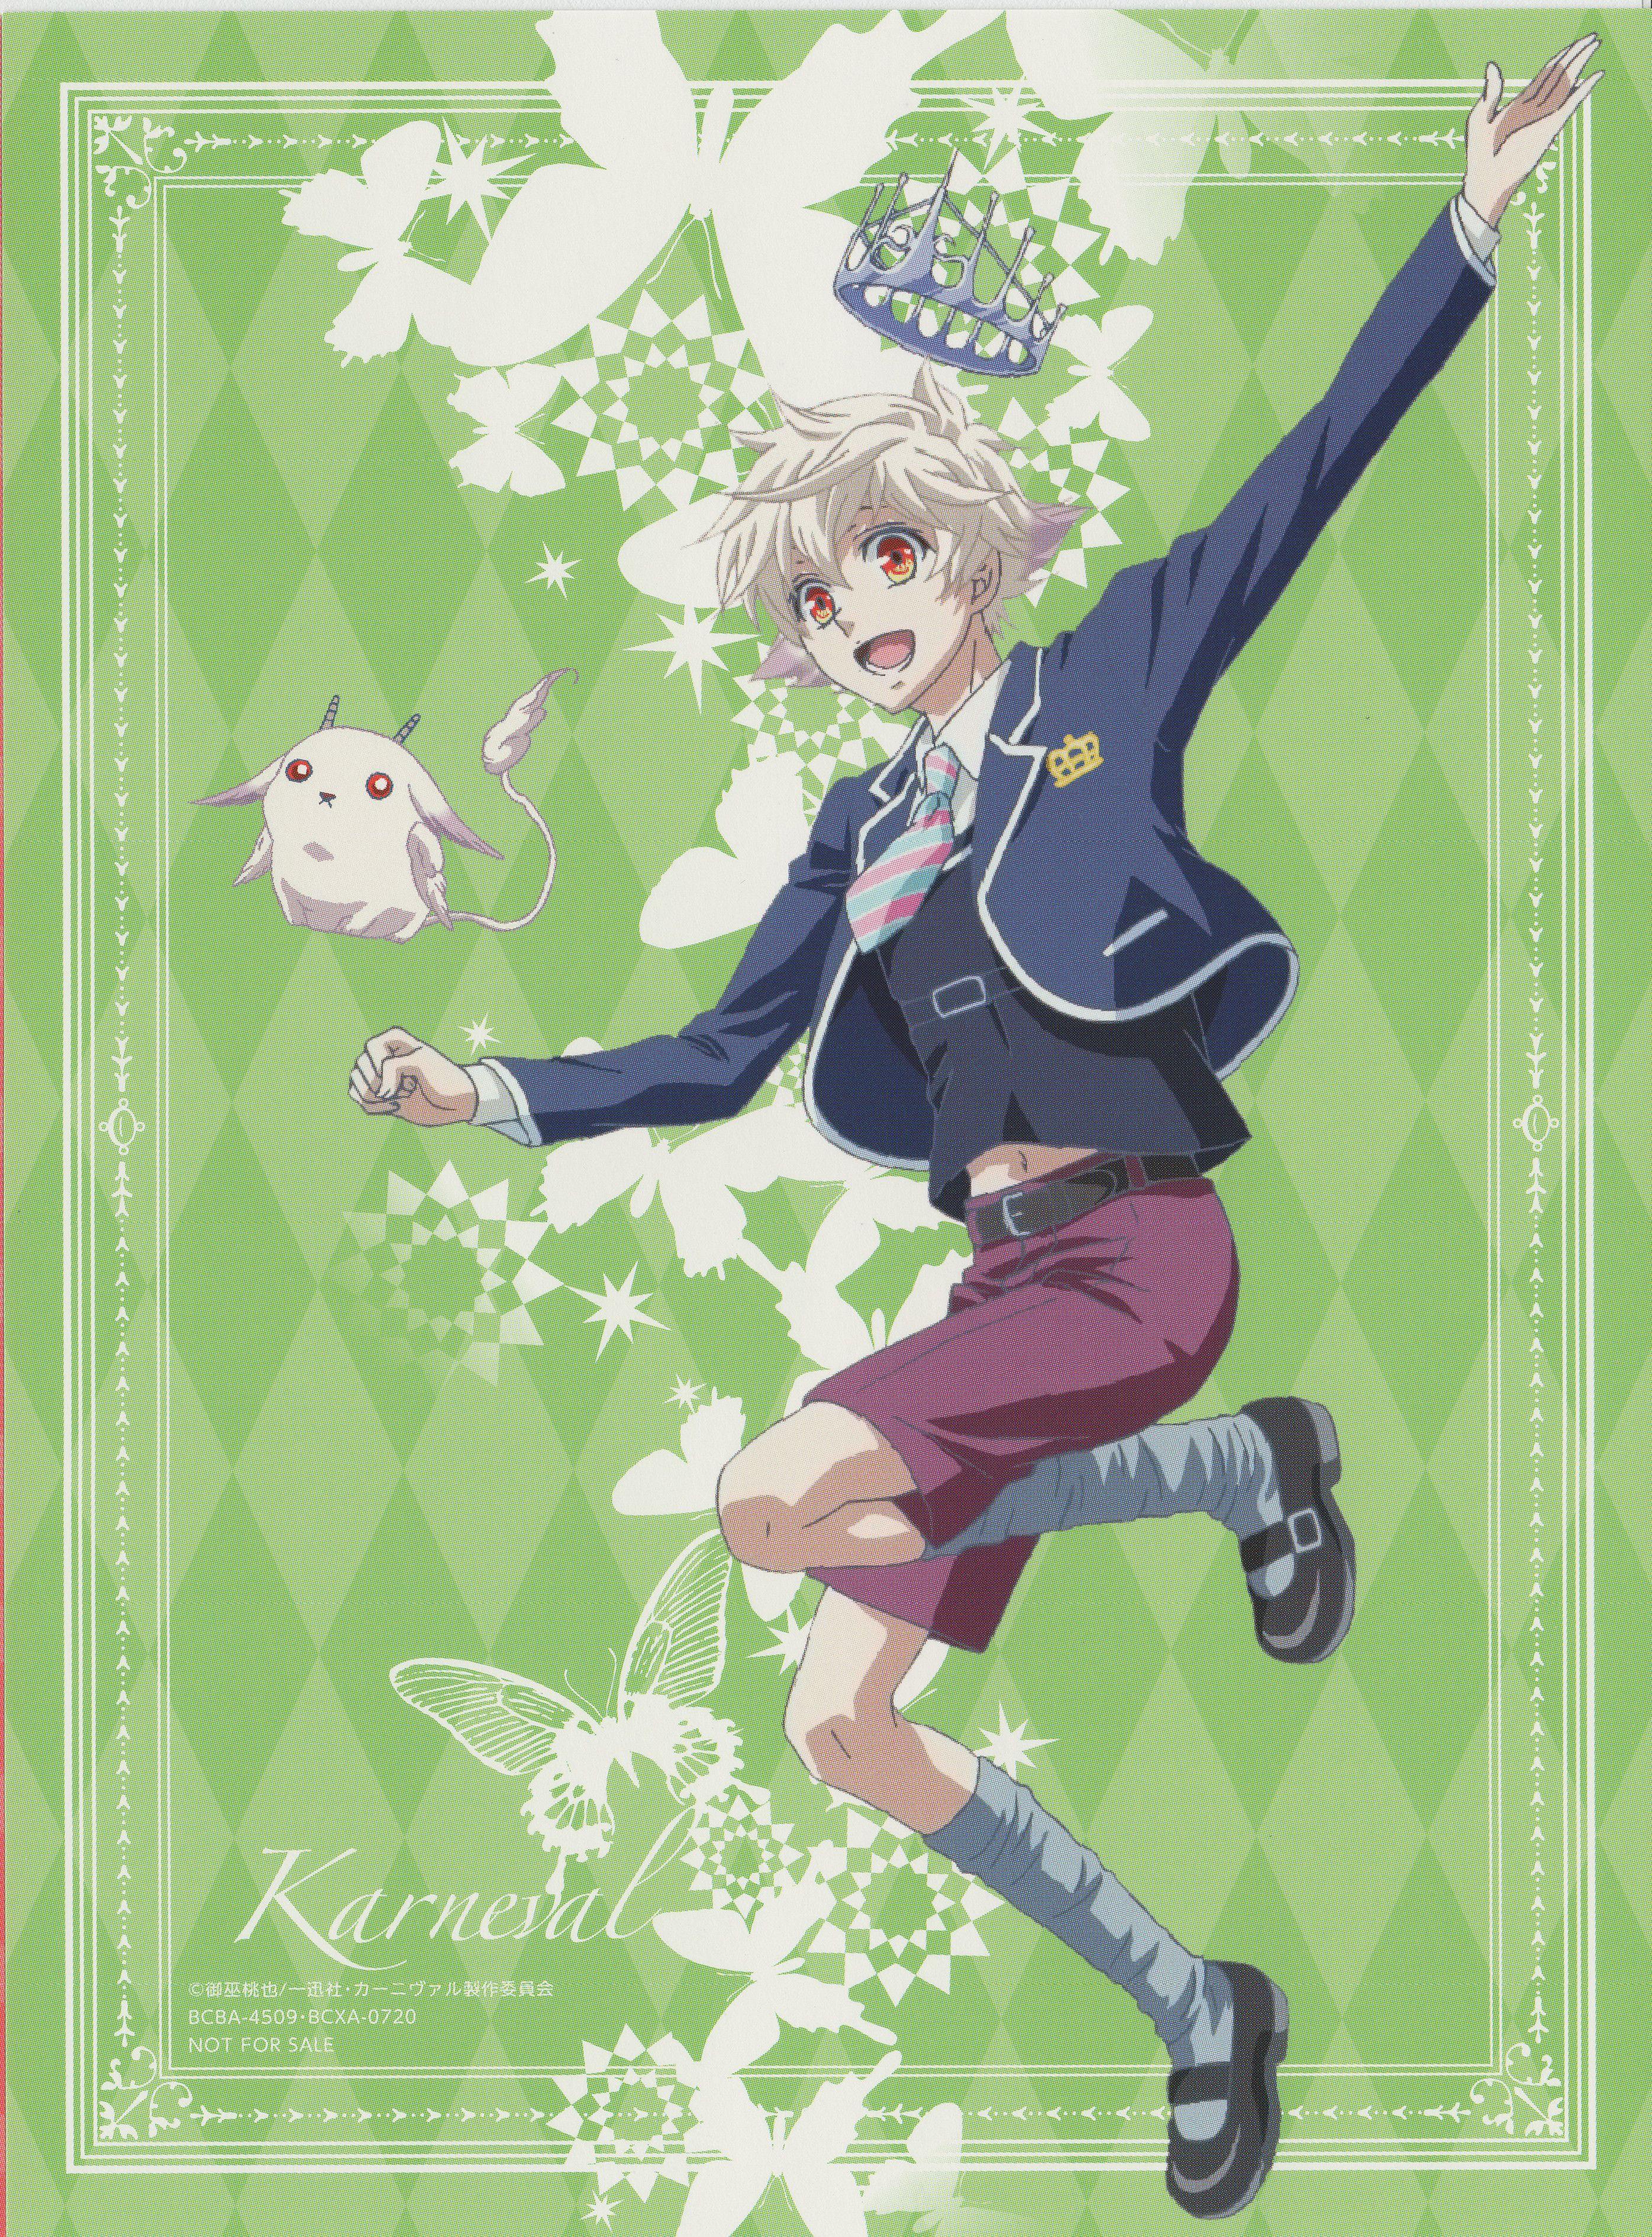 Nai (Karneval)/#1626463 - Zerochan | Anime | Anime, Nai ...